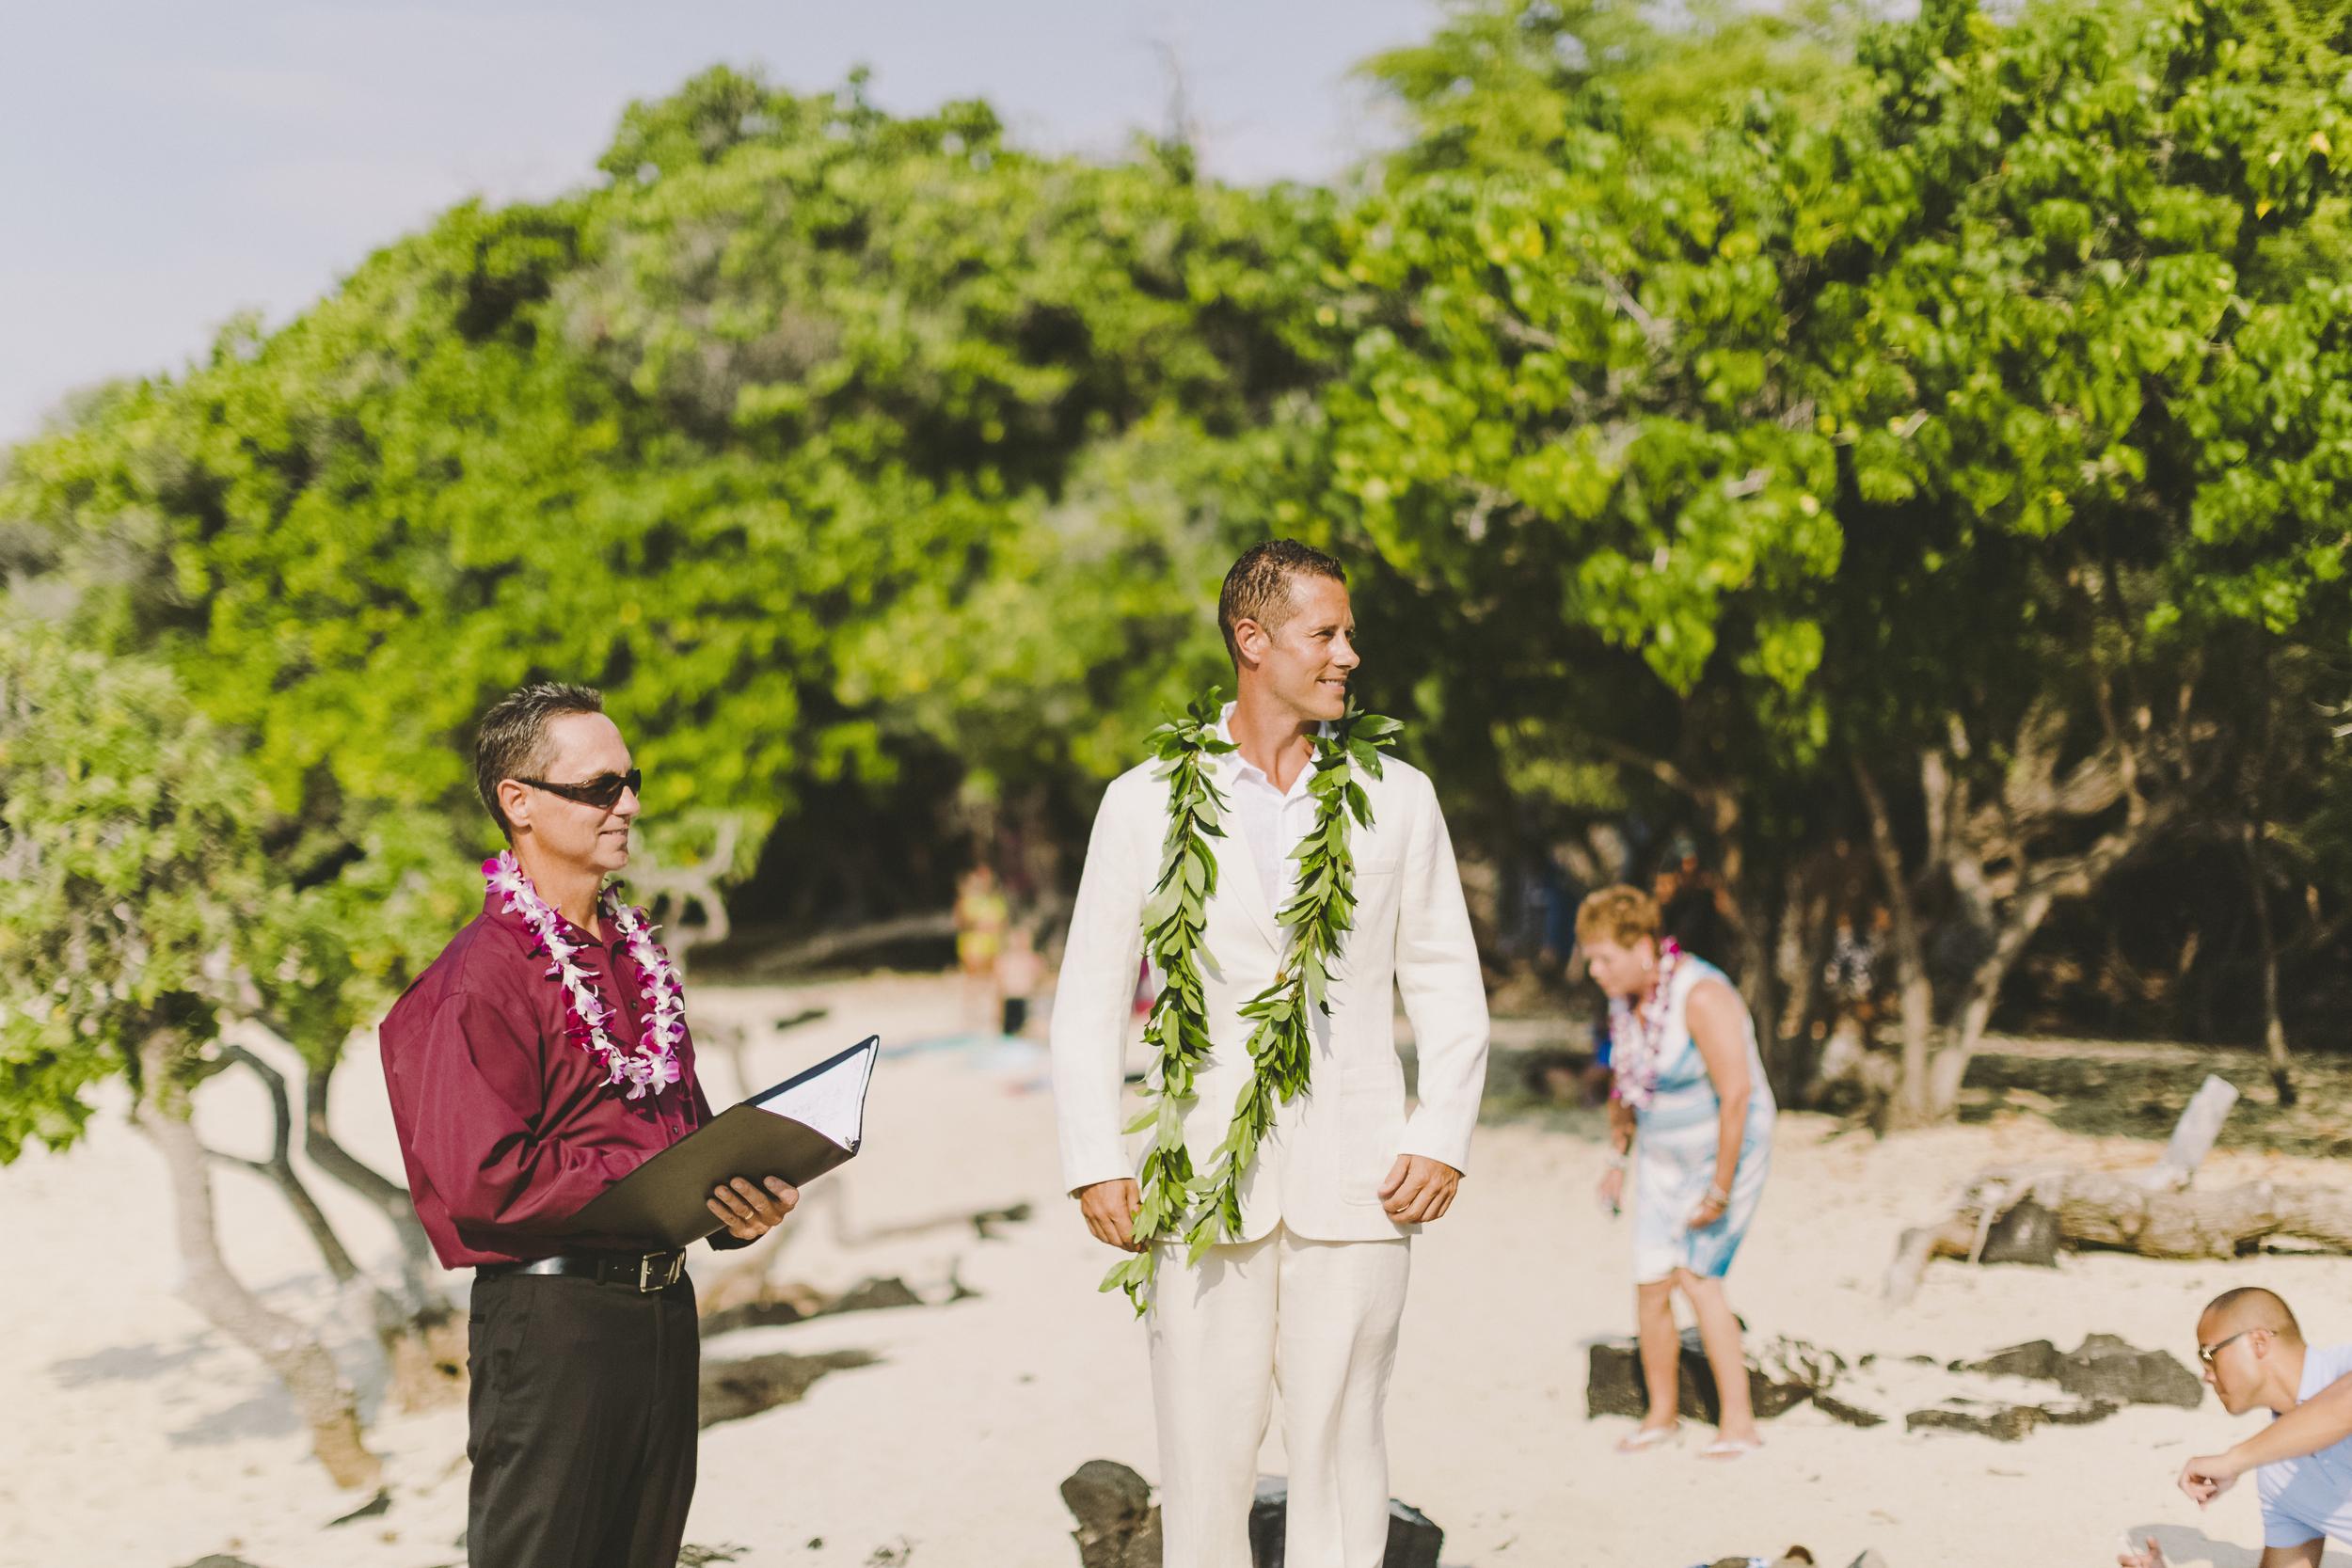 angie-diaz-photography-hawaii-wedding-photographer-kelli-jay-45.jpg